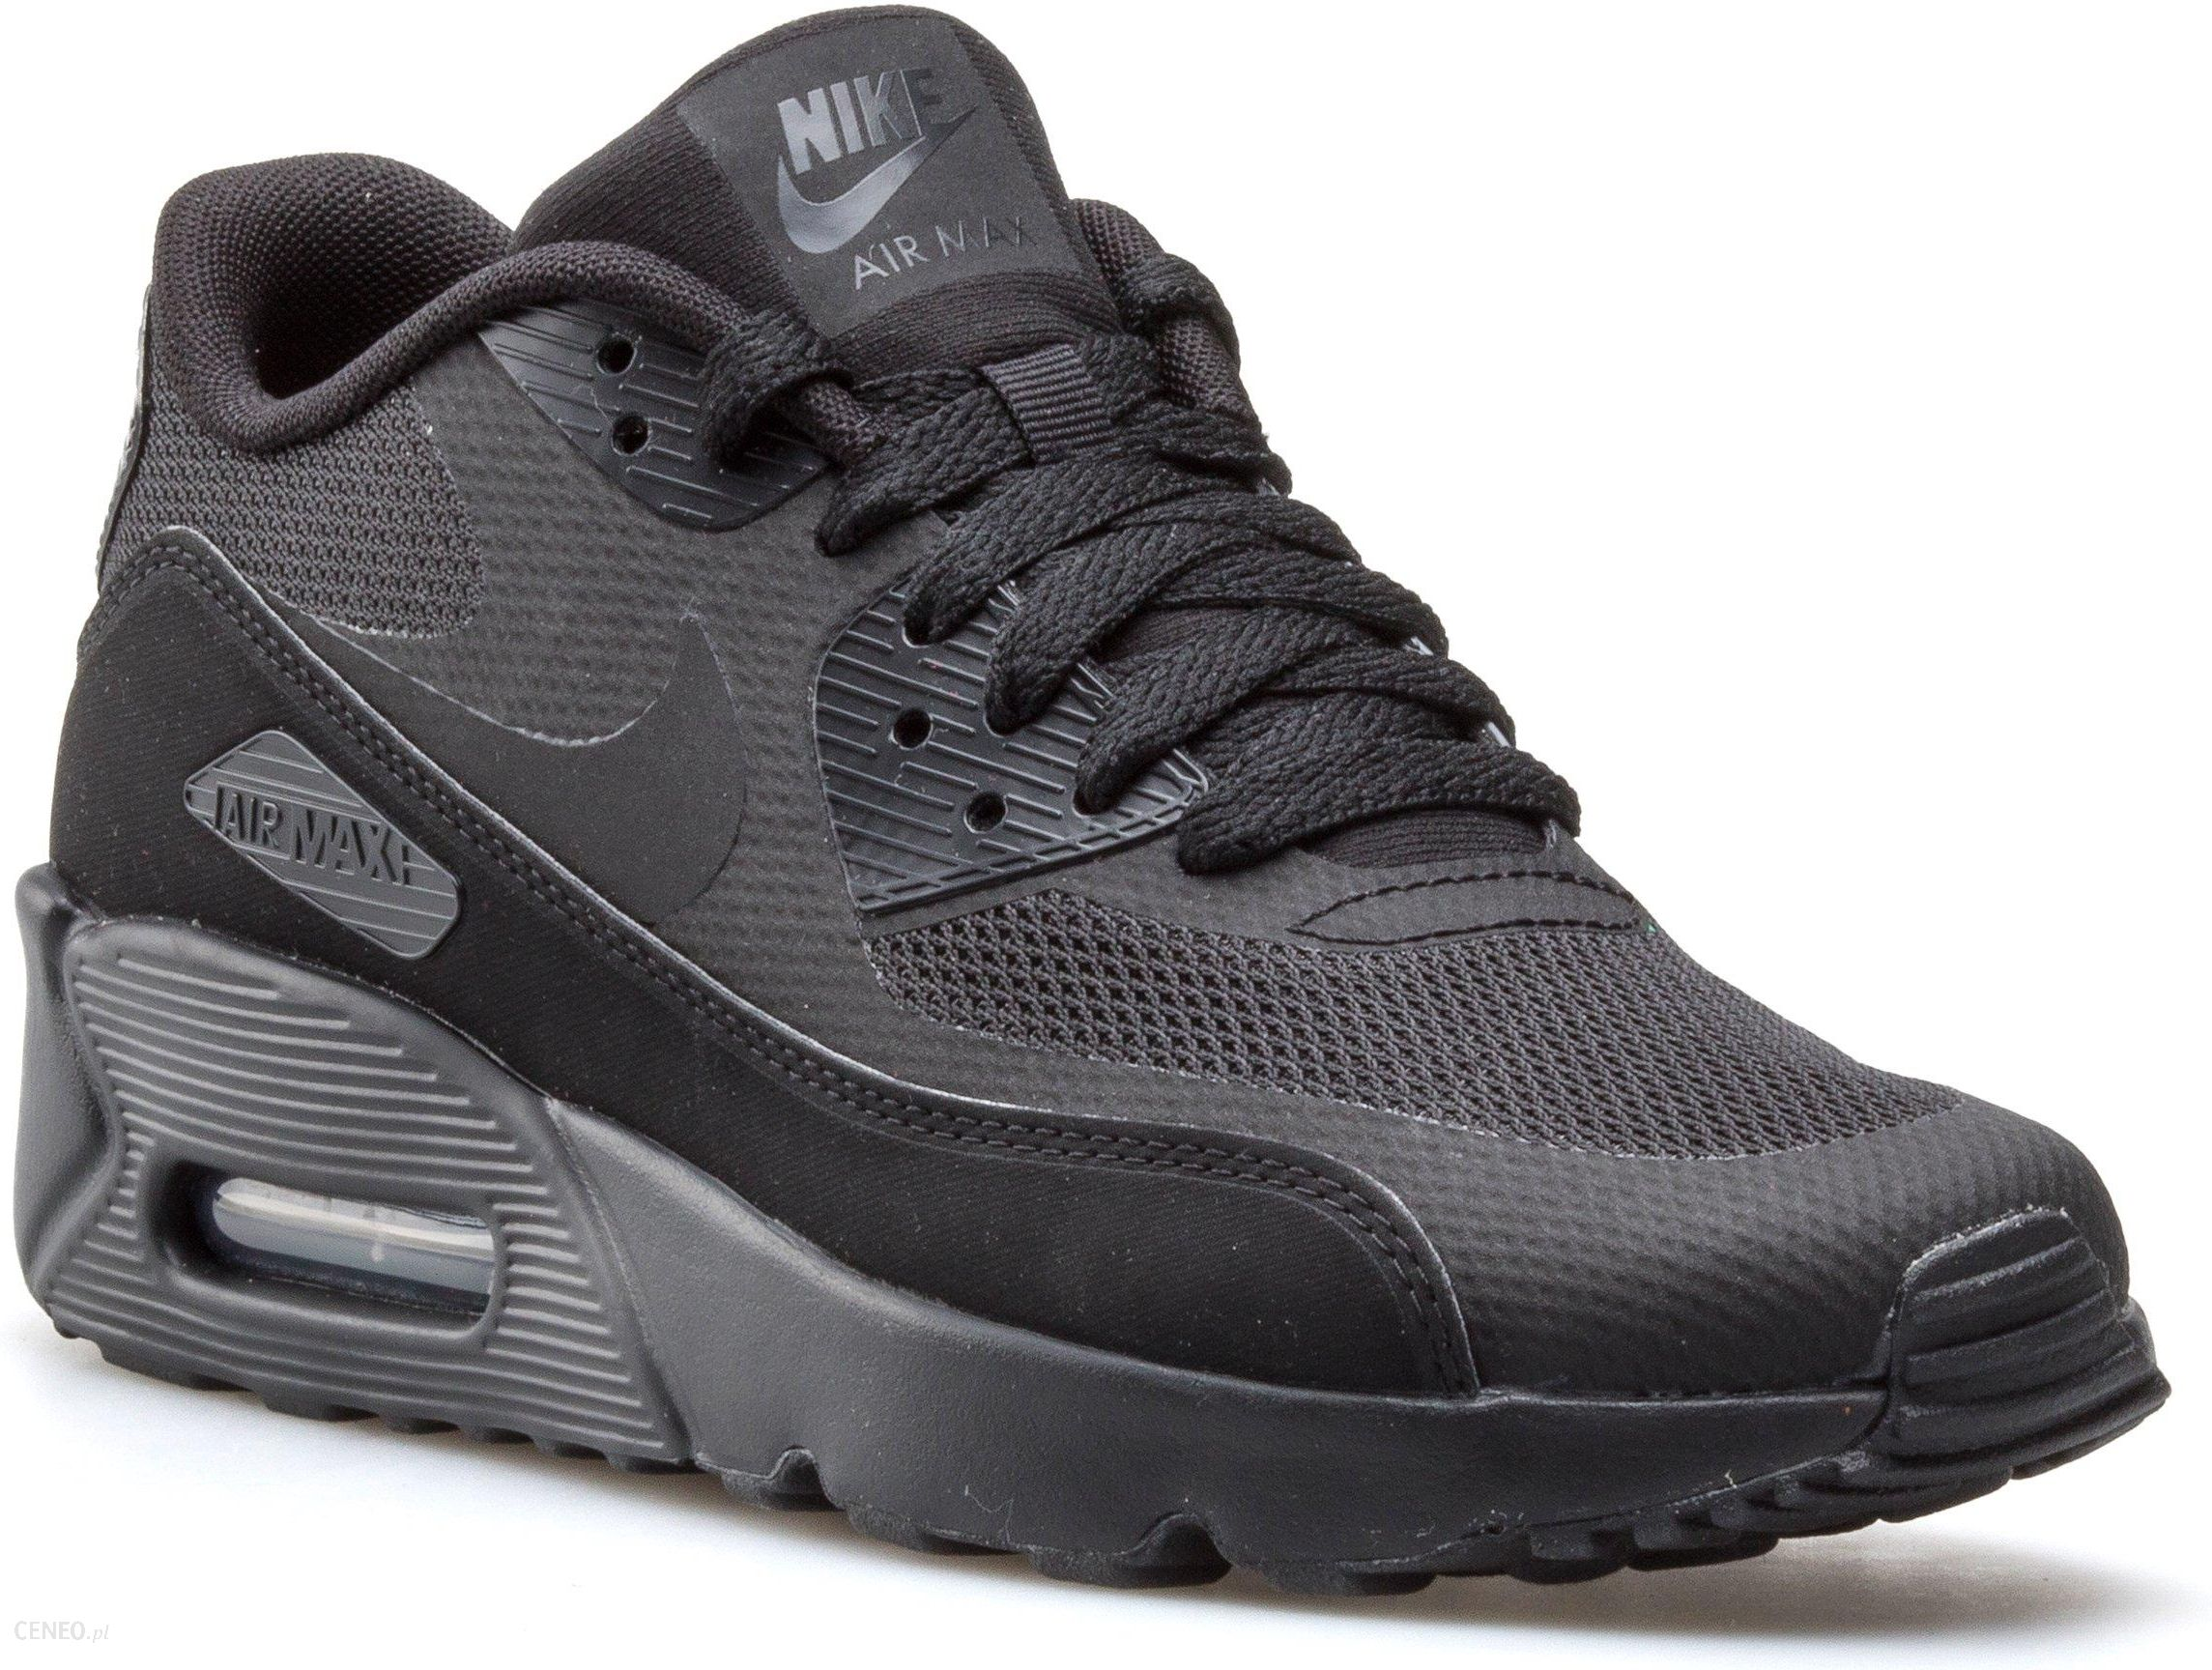 buy popular 60de1 59d00 Buty Nike Air Max 90 Ultra 2.0 869950-001 r. 40 - Ceny i opinie ...